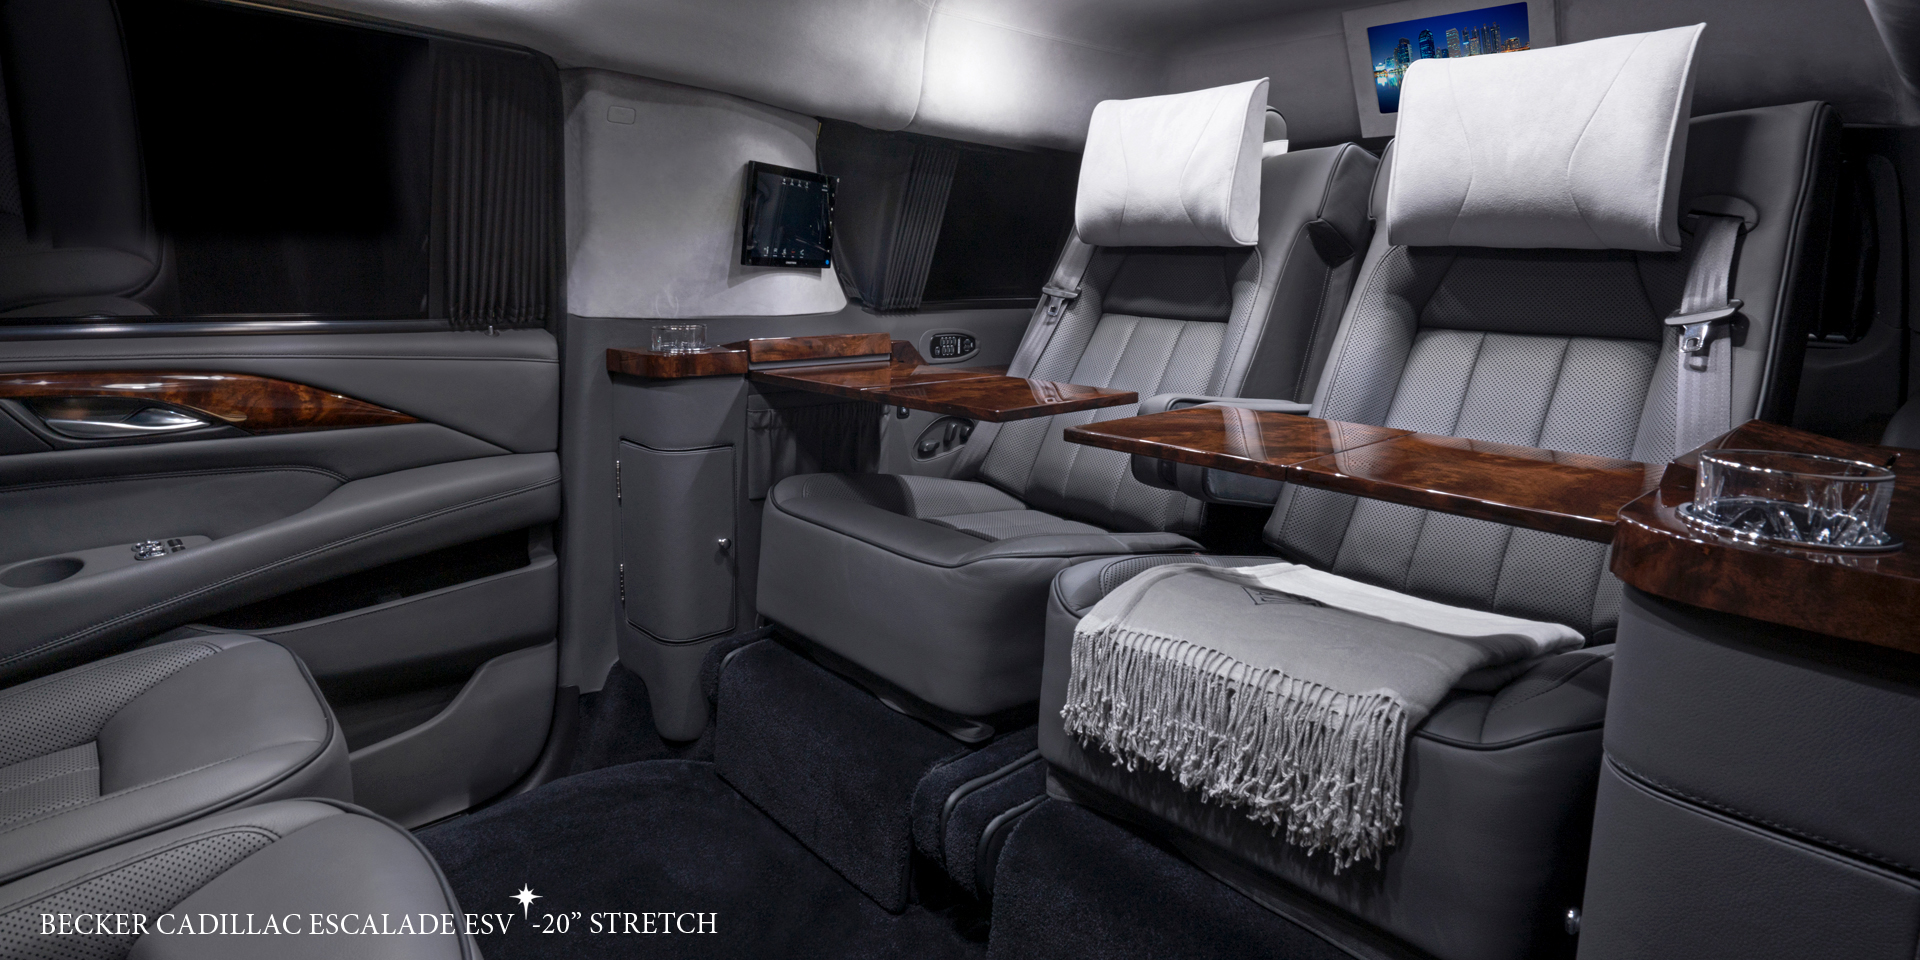 Cadillac Escalade Redesign >> Becker Automotive Design // Luxury Transport Coaches // Sprinter Van and Cadillac ESV Conversions